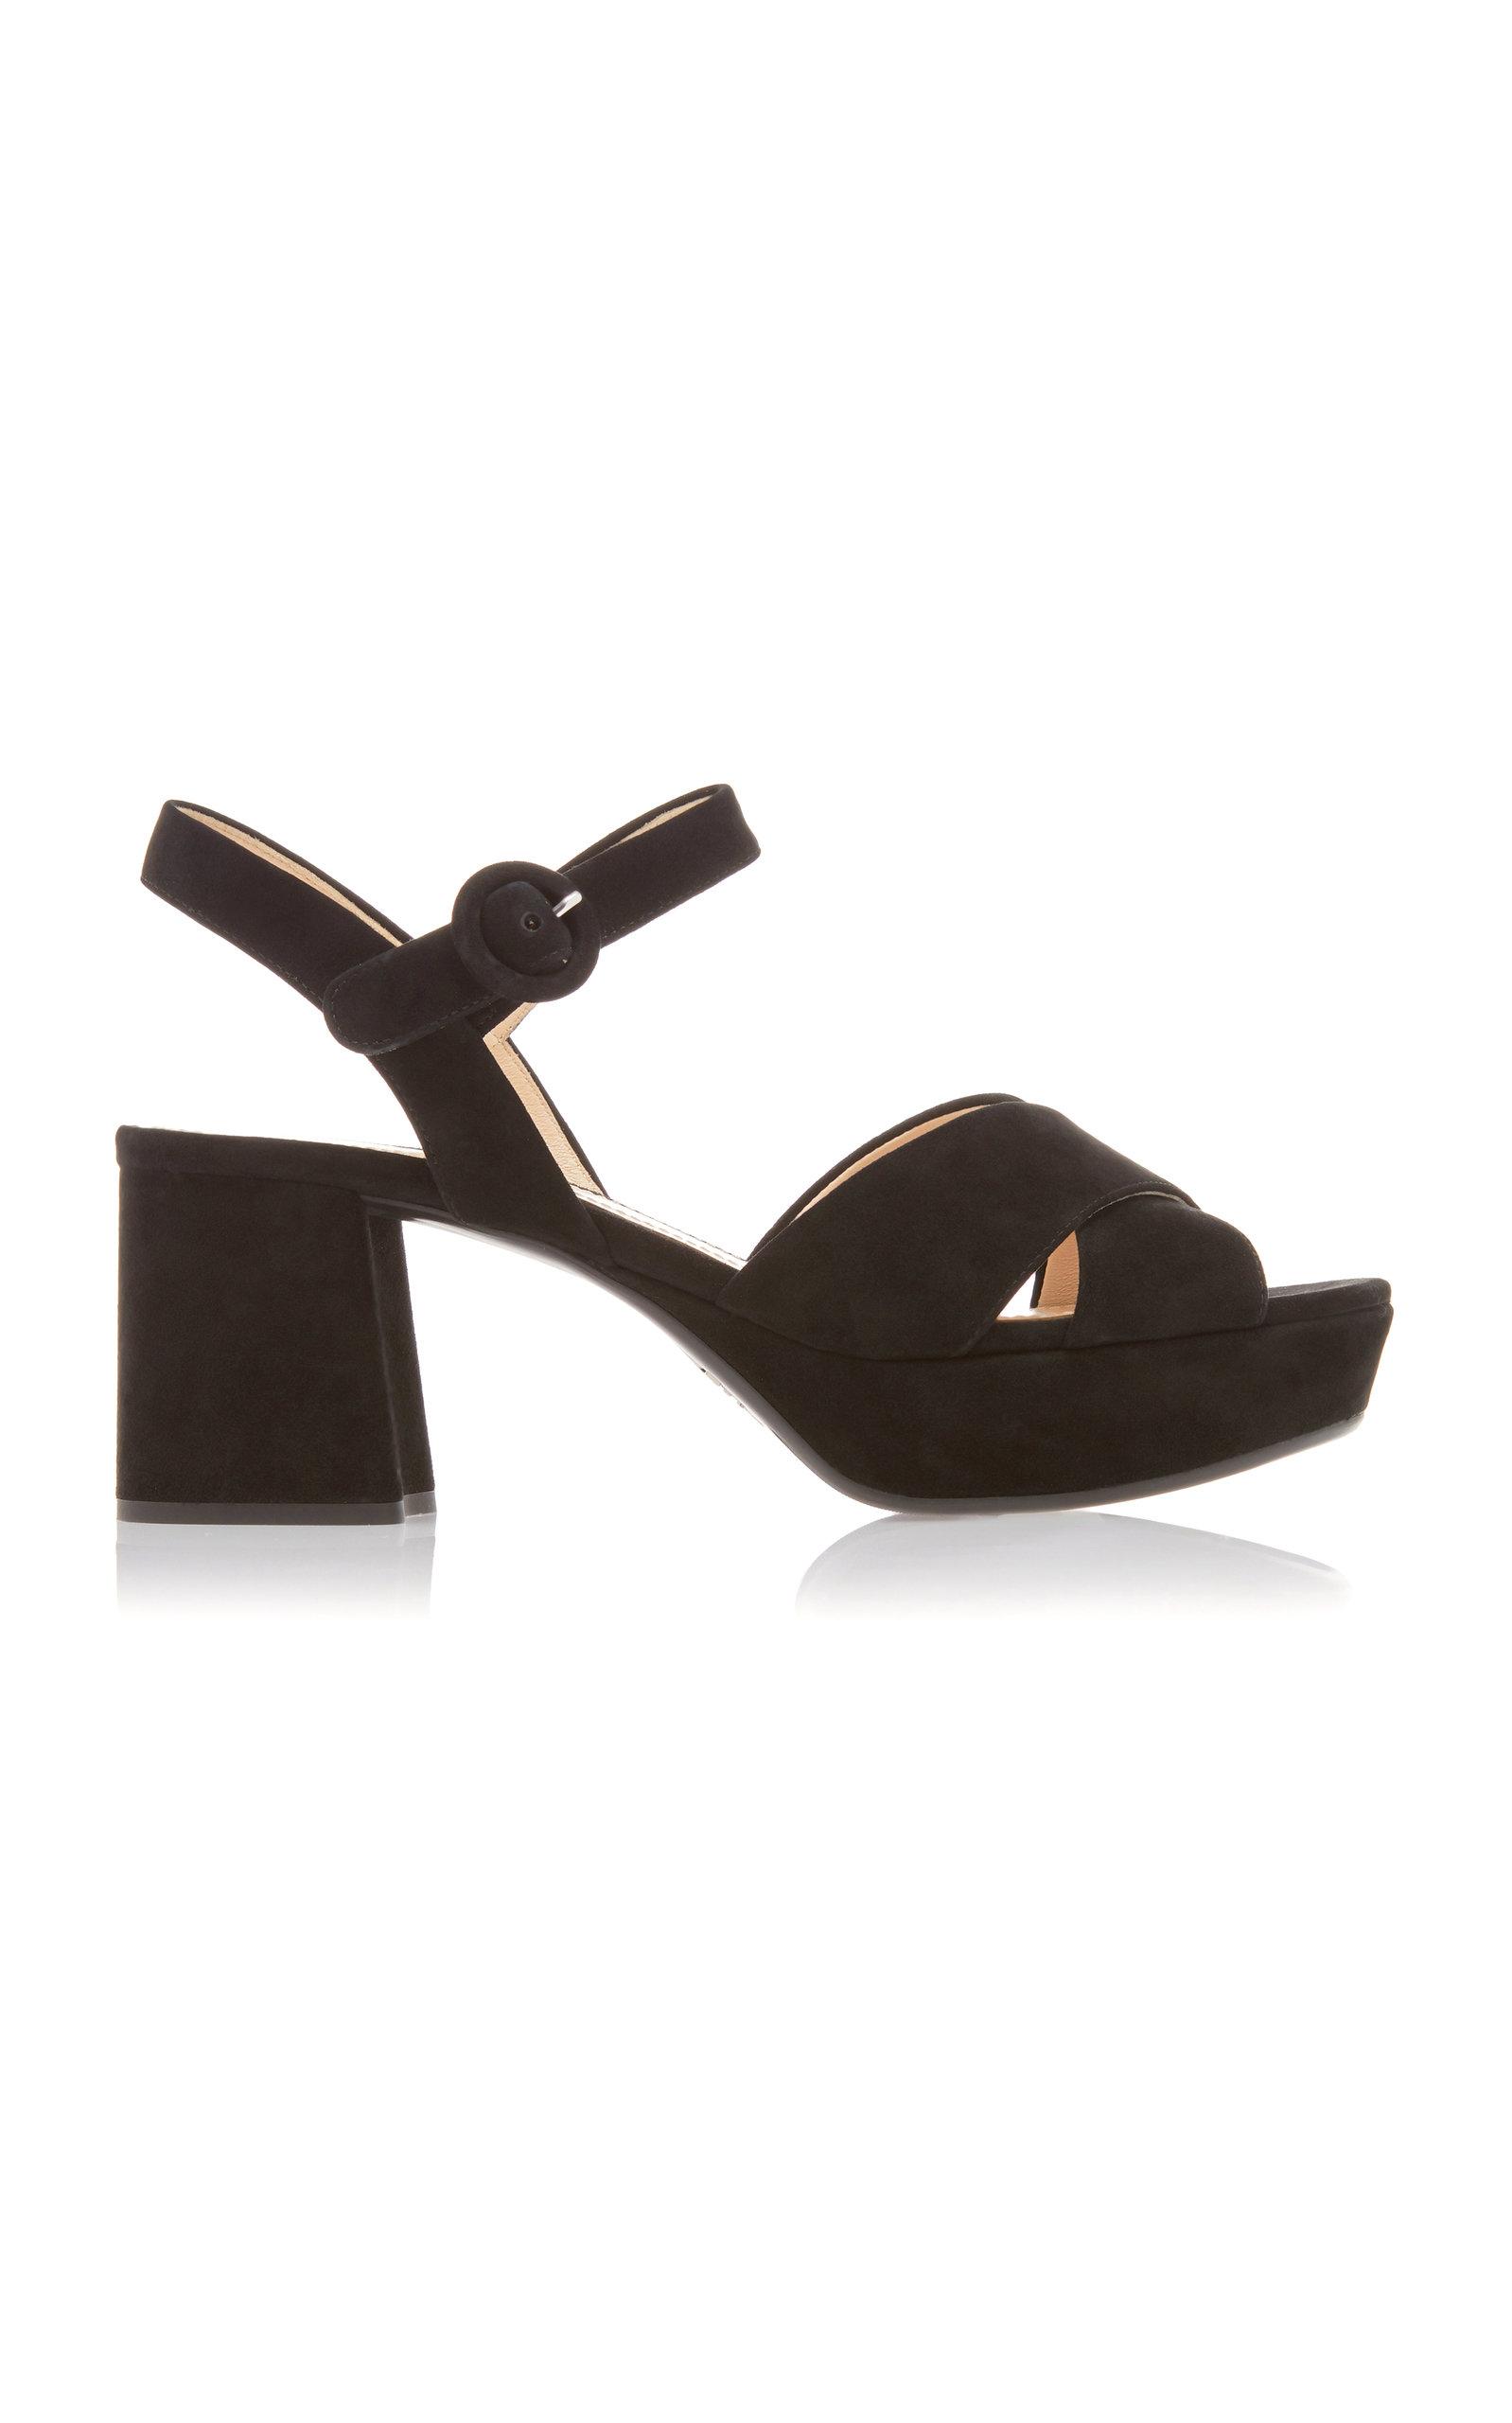 76704a553bf2 Prada Suede Platform Sandals In Black